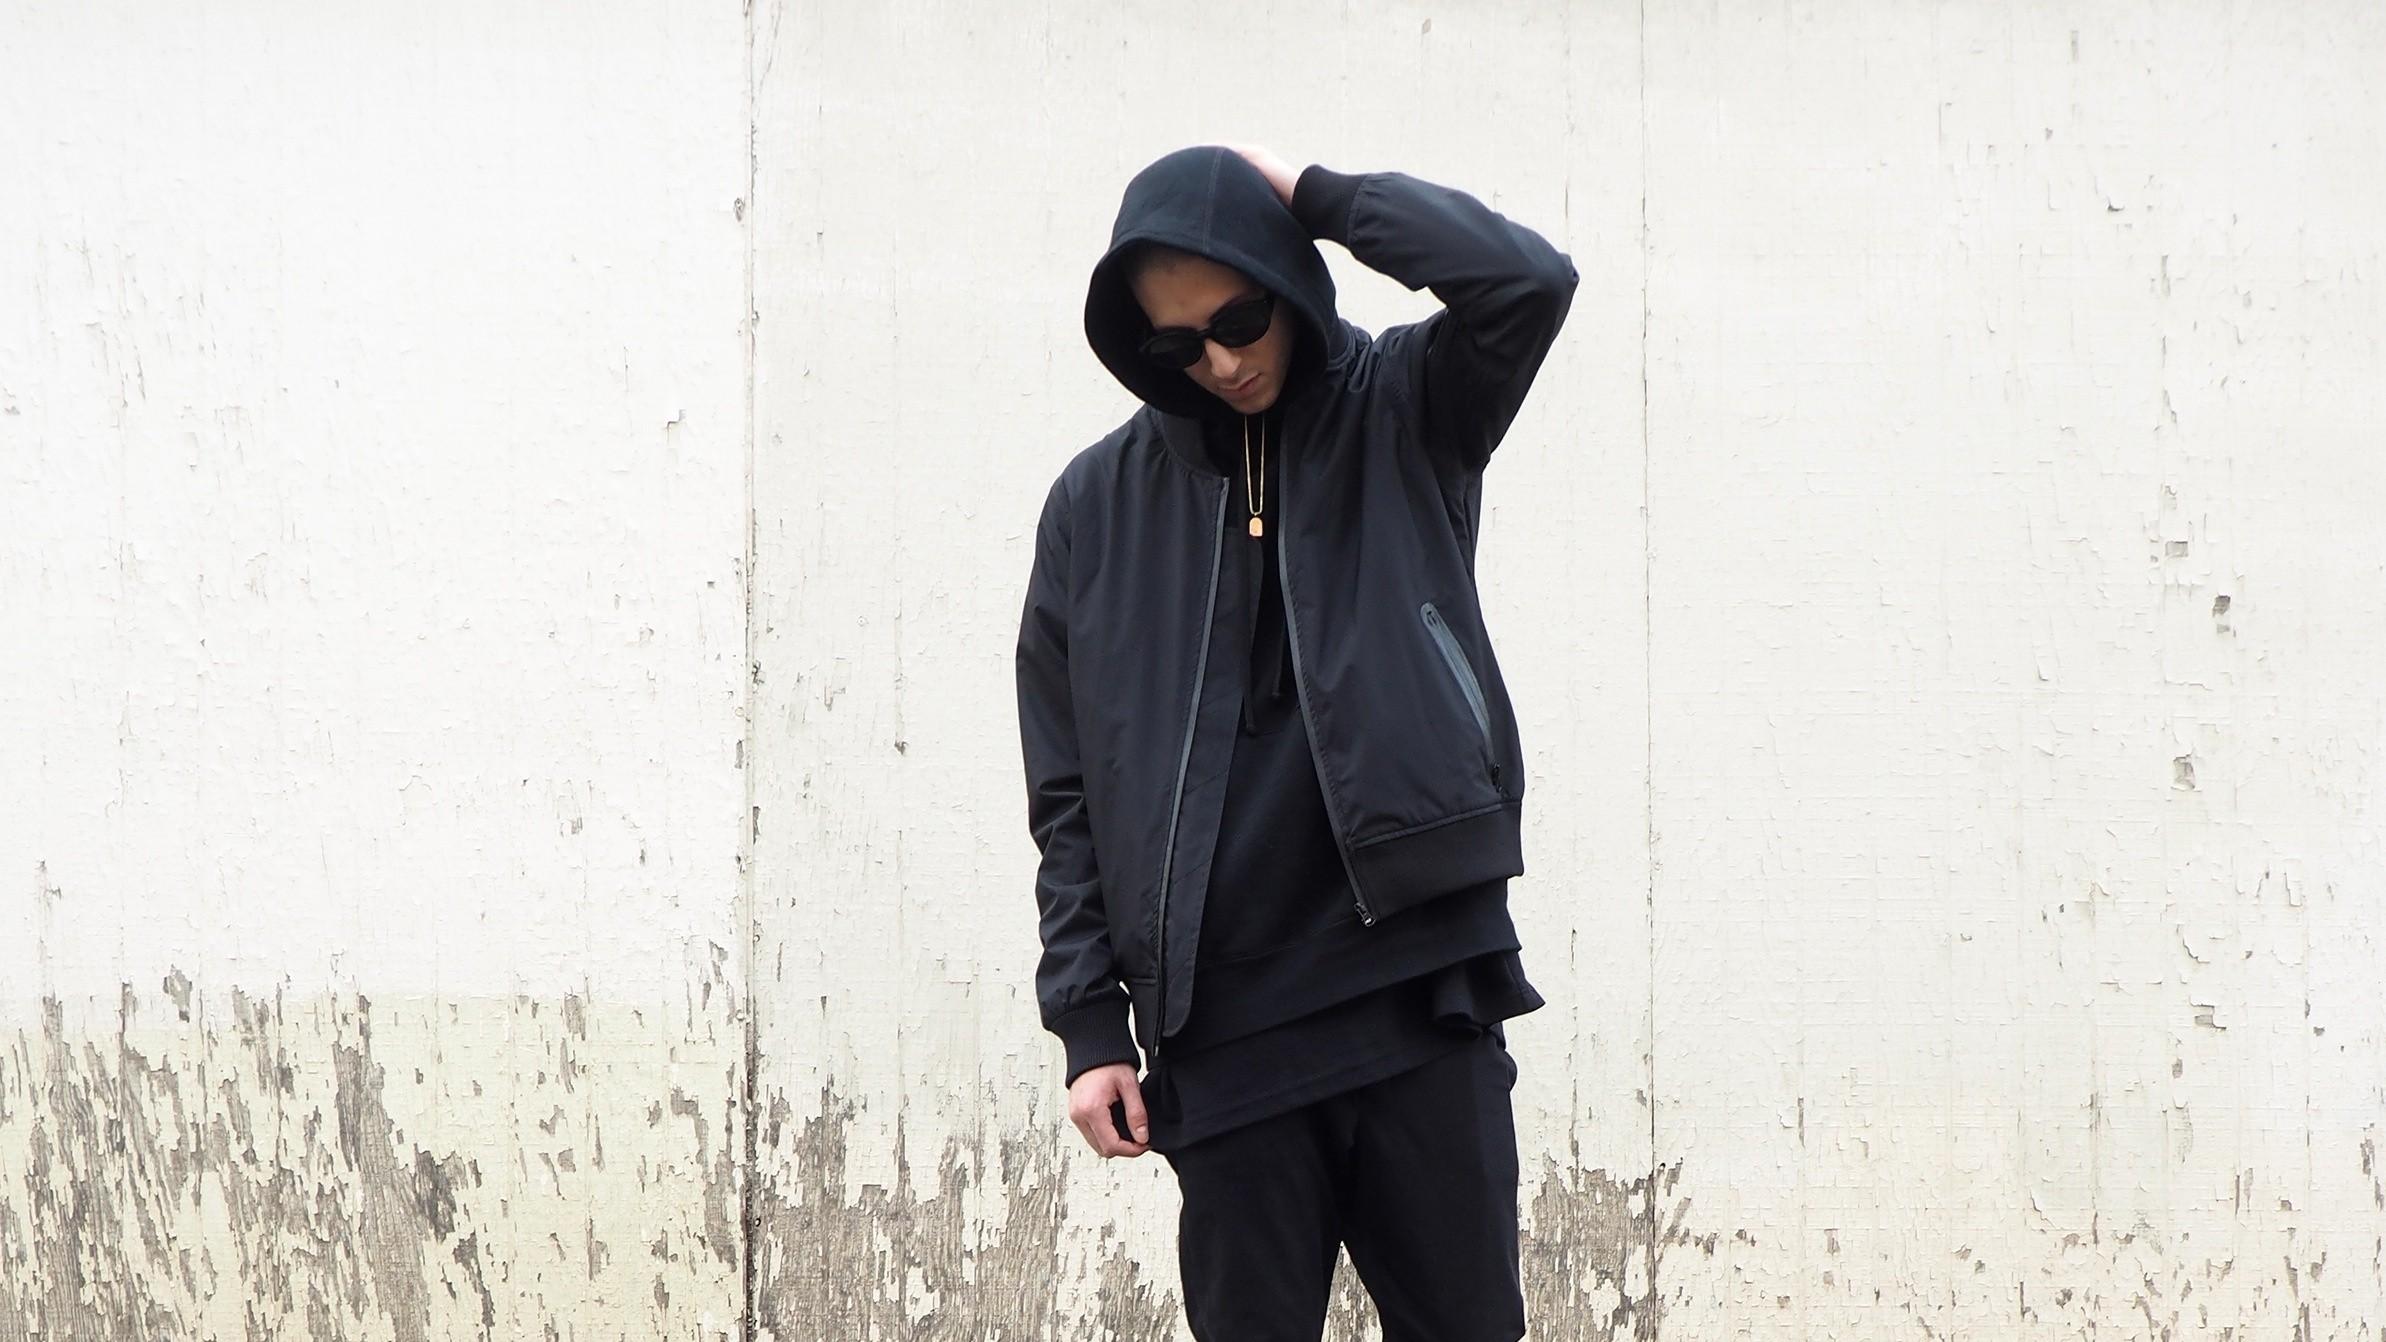 Shlohmo Announces Sophomore LP 'Dark Red,' Streams New Single